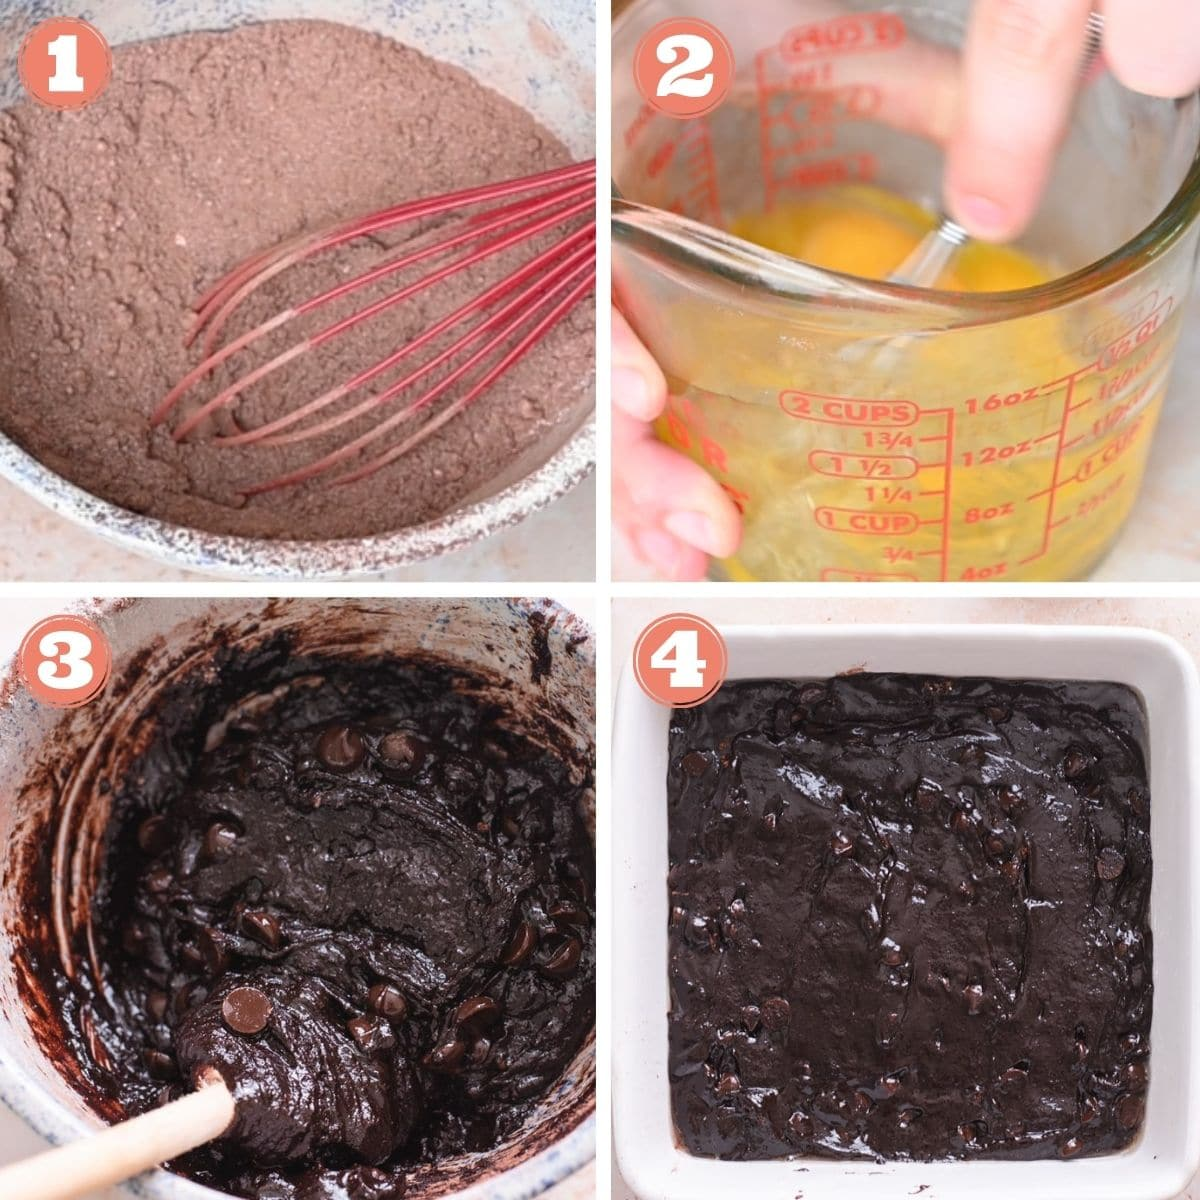 Steps 1 through 4 to make brownies